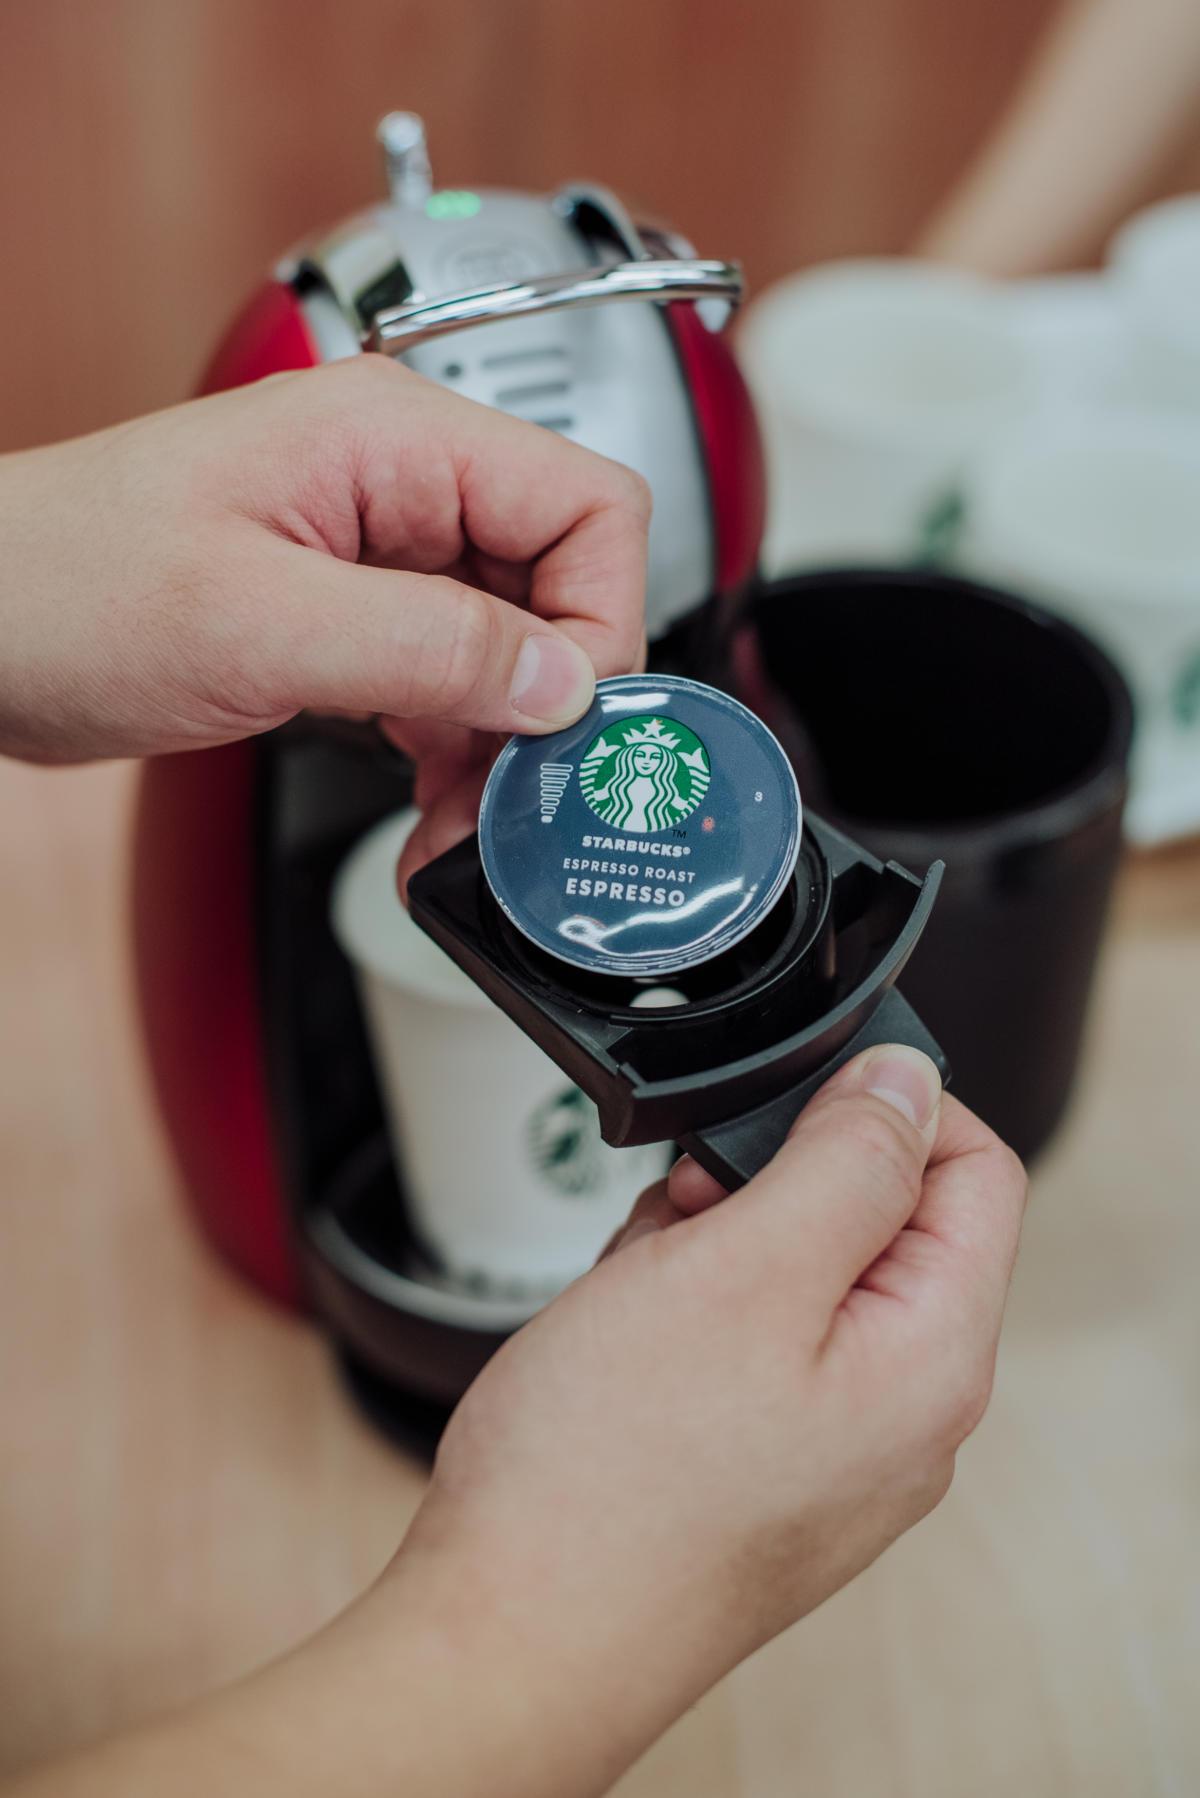 Nestle Starbucks at Home launch – 119